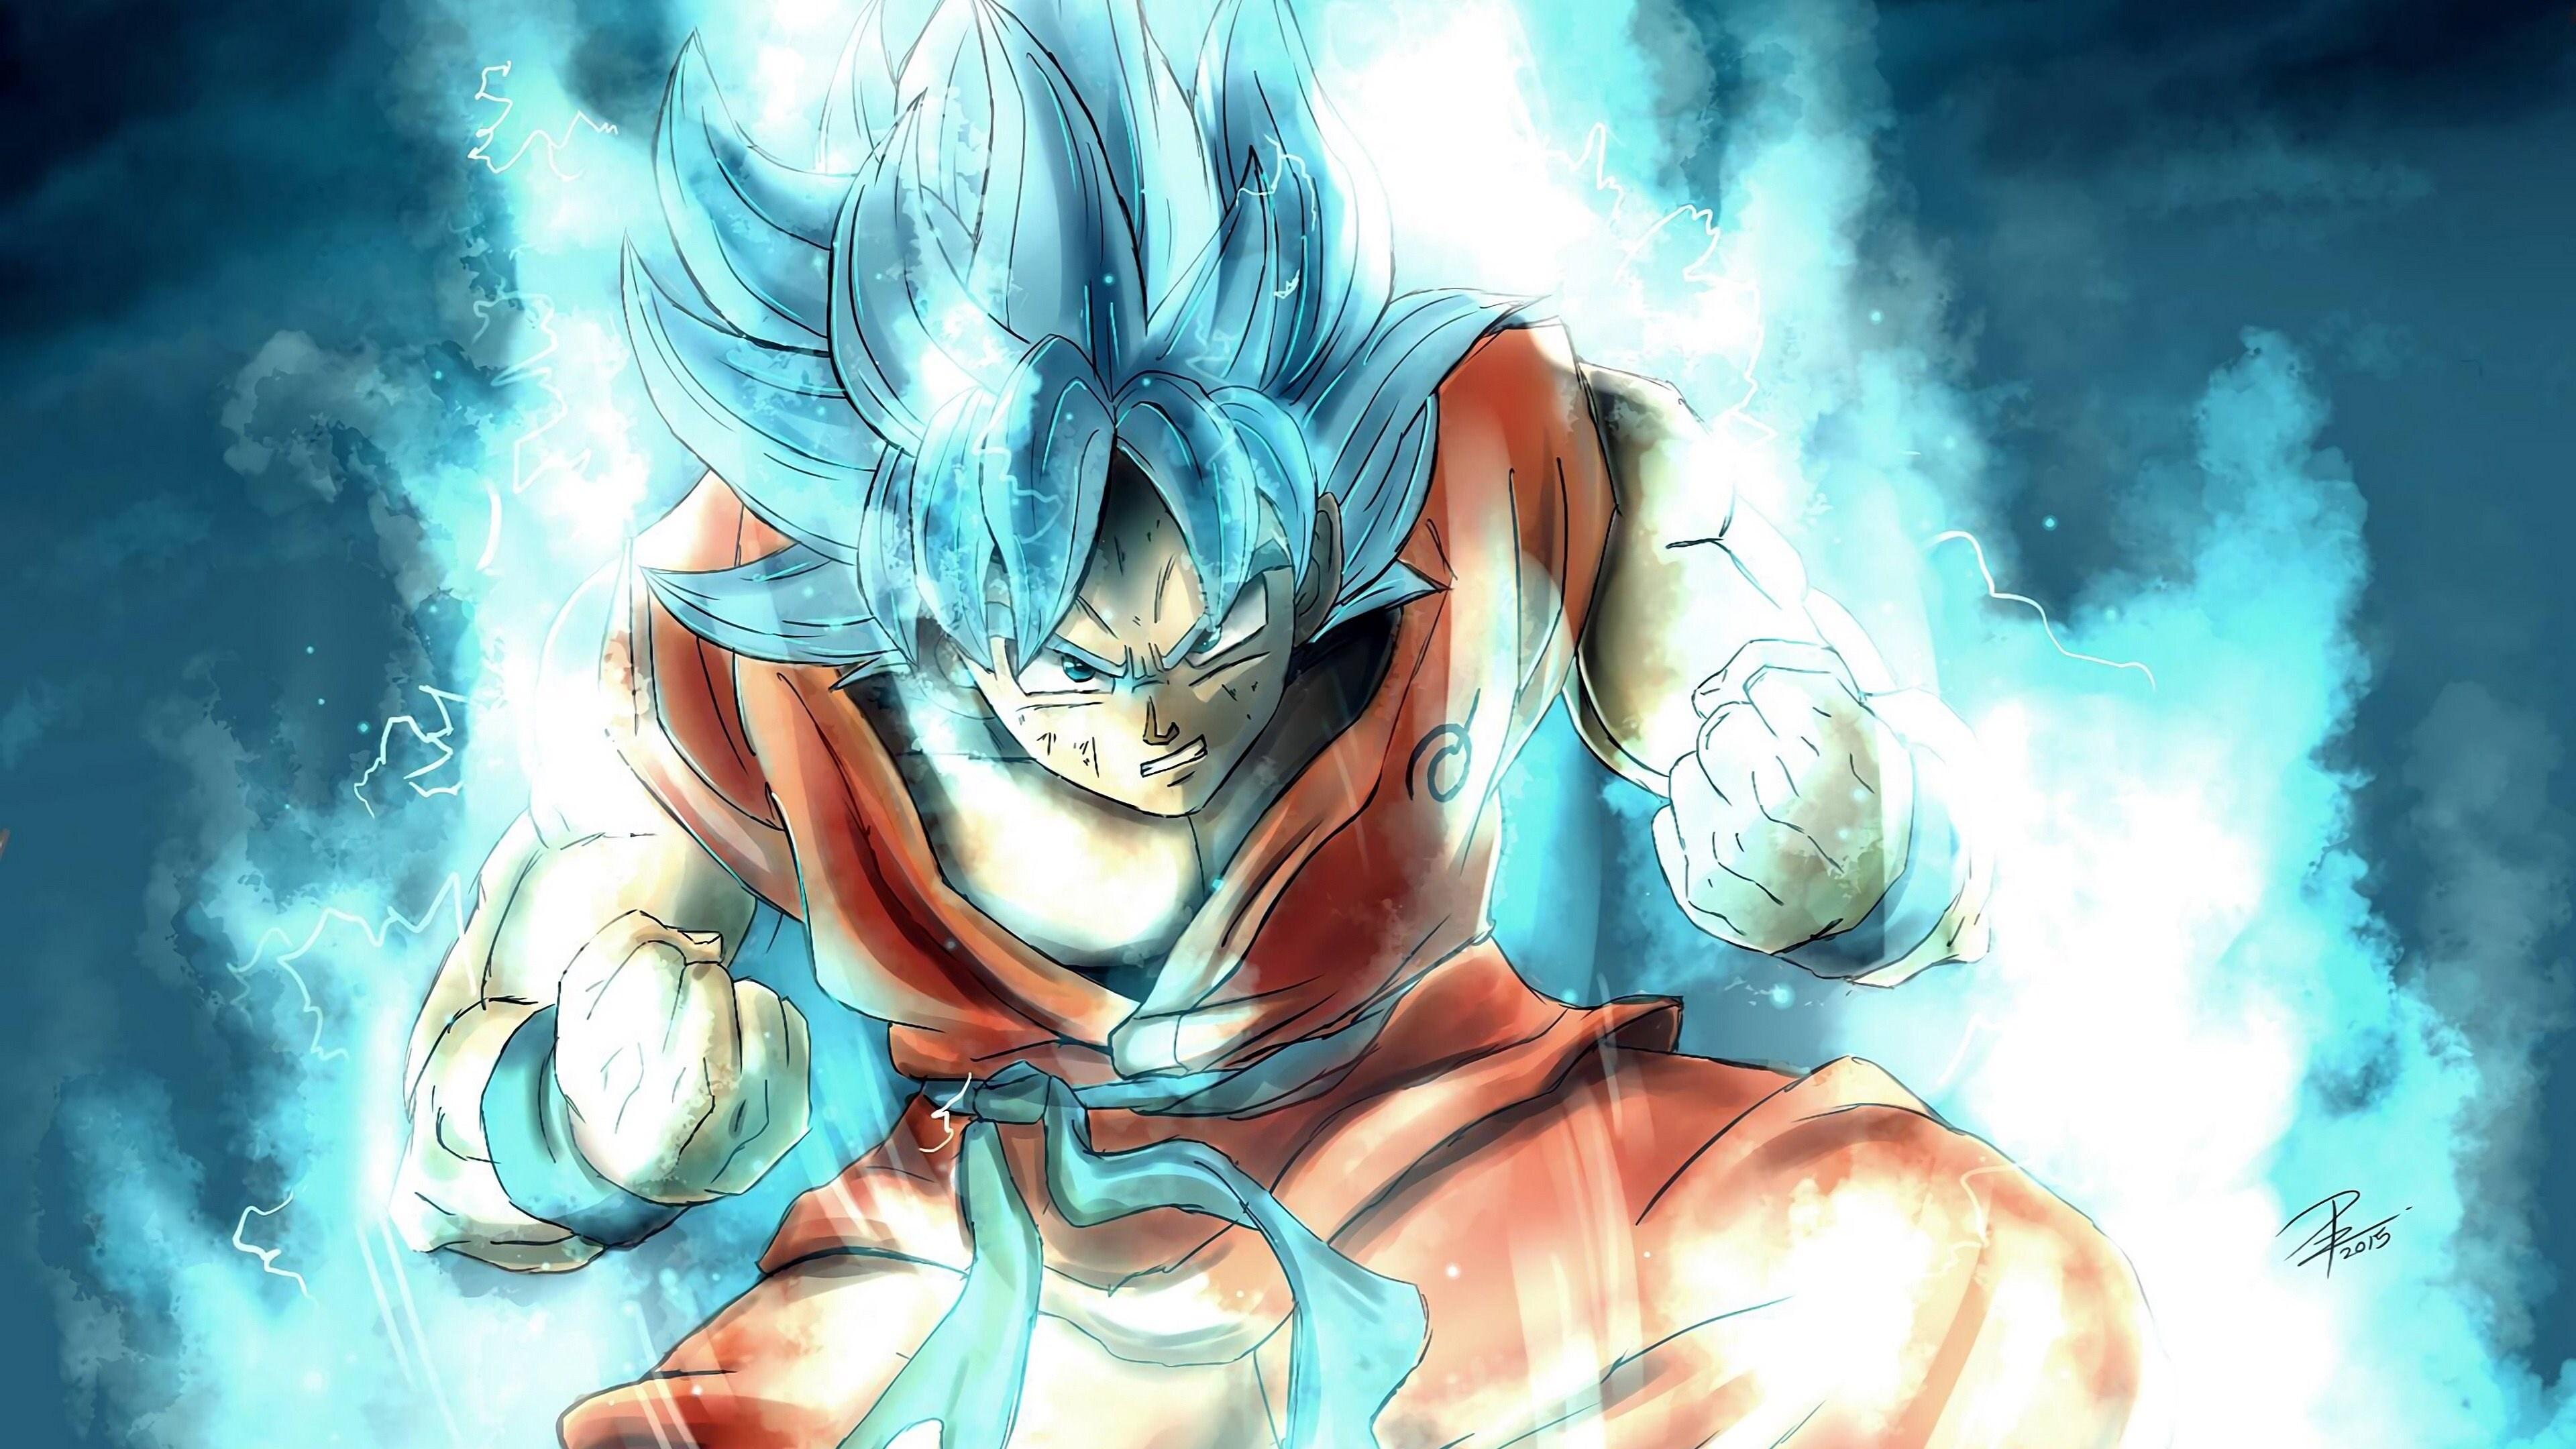 Goku background wallpaper